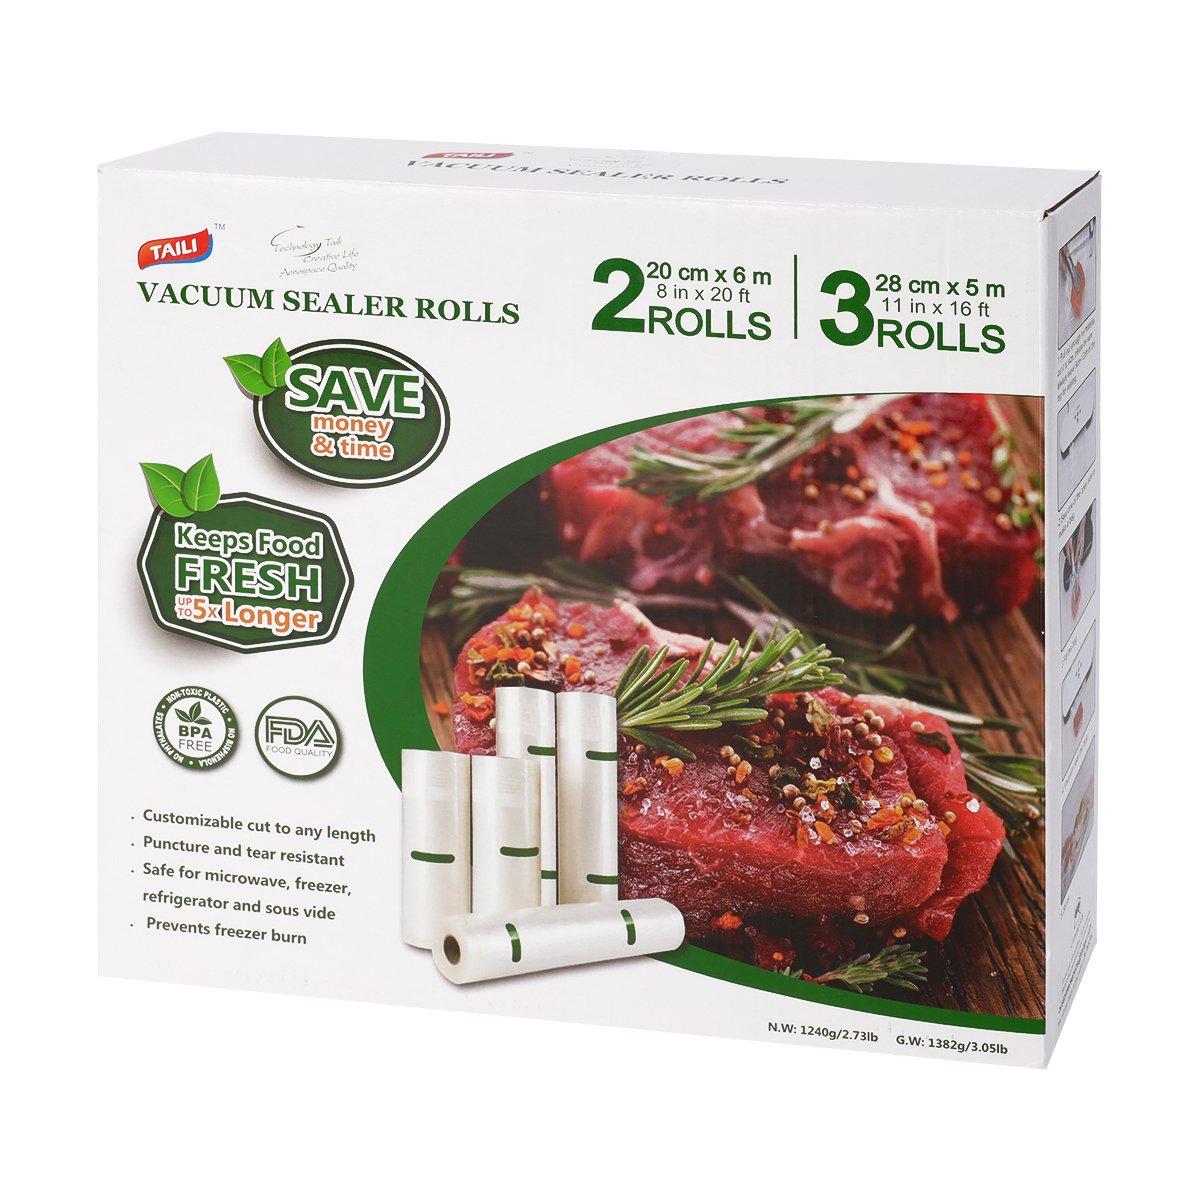 TAILI 5 Vacuum Food Sealer Rolls (3 Rolls 11'' x16.4' + 2 Rolls 8'' x20') BPA Free, Commercial Grade, Great for Food Saver Storage, Microwave & Freezer Safe